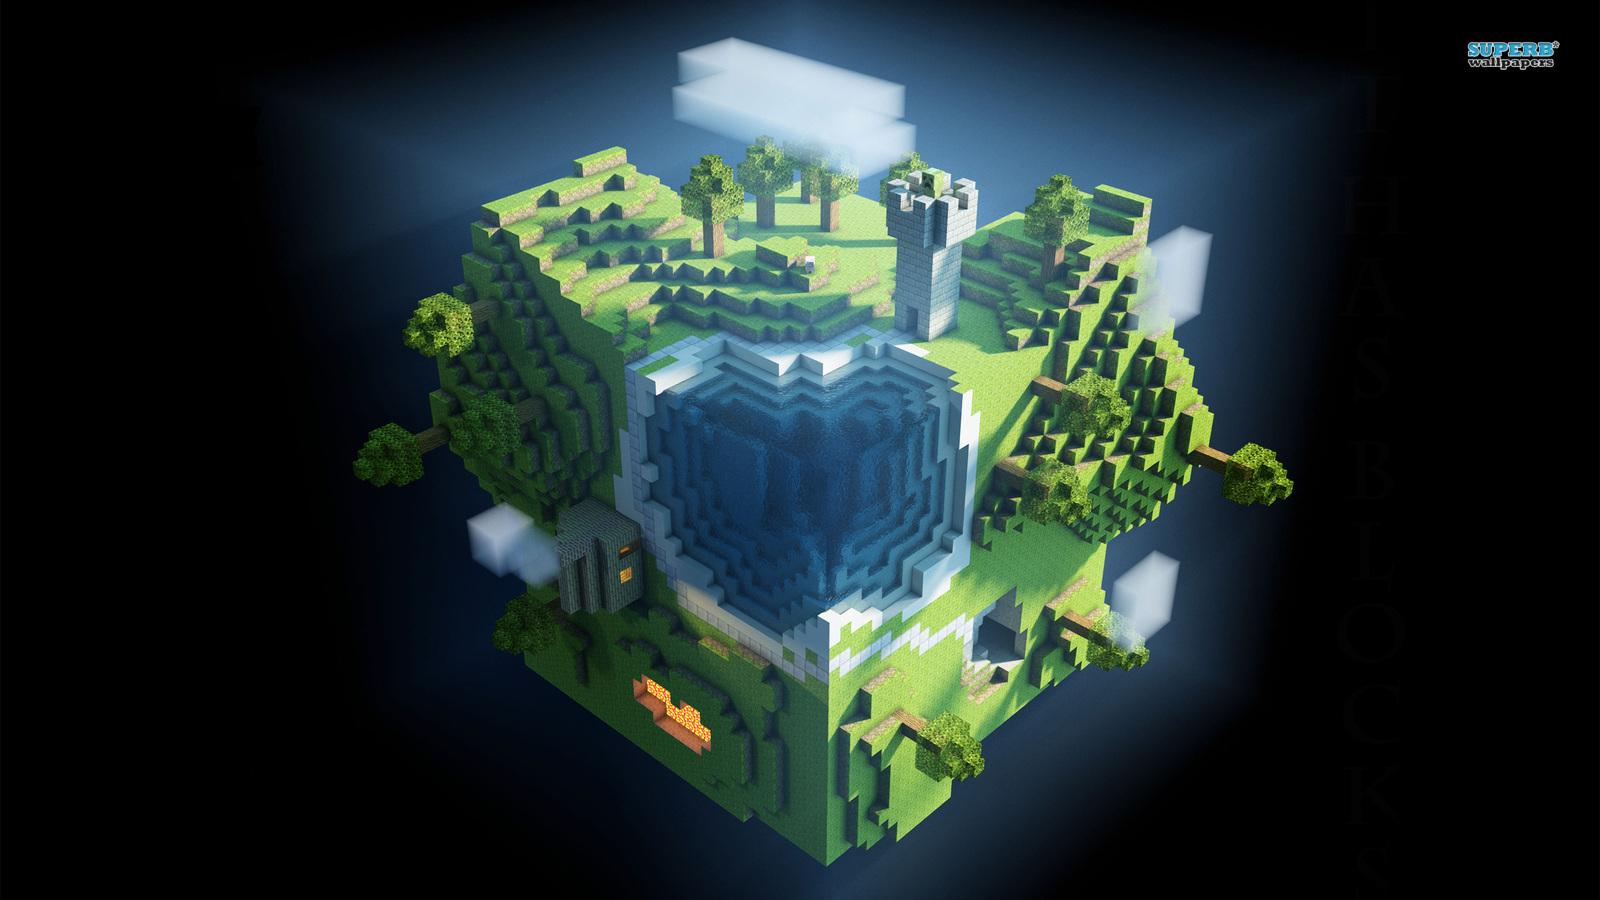 Minecraft Minecraft Fond Décran 38685831 Fanpop